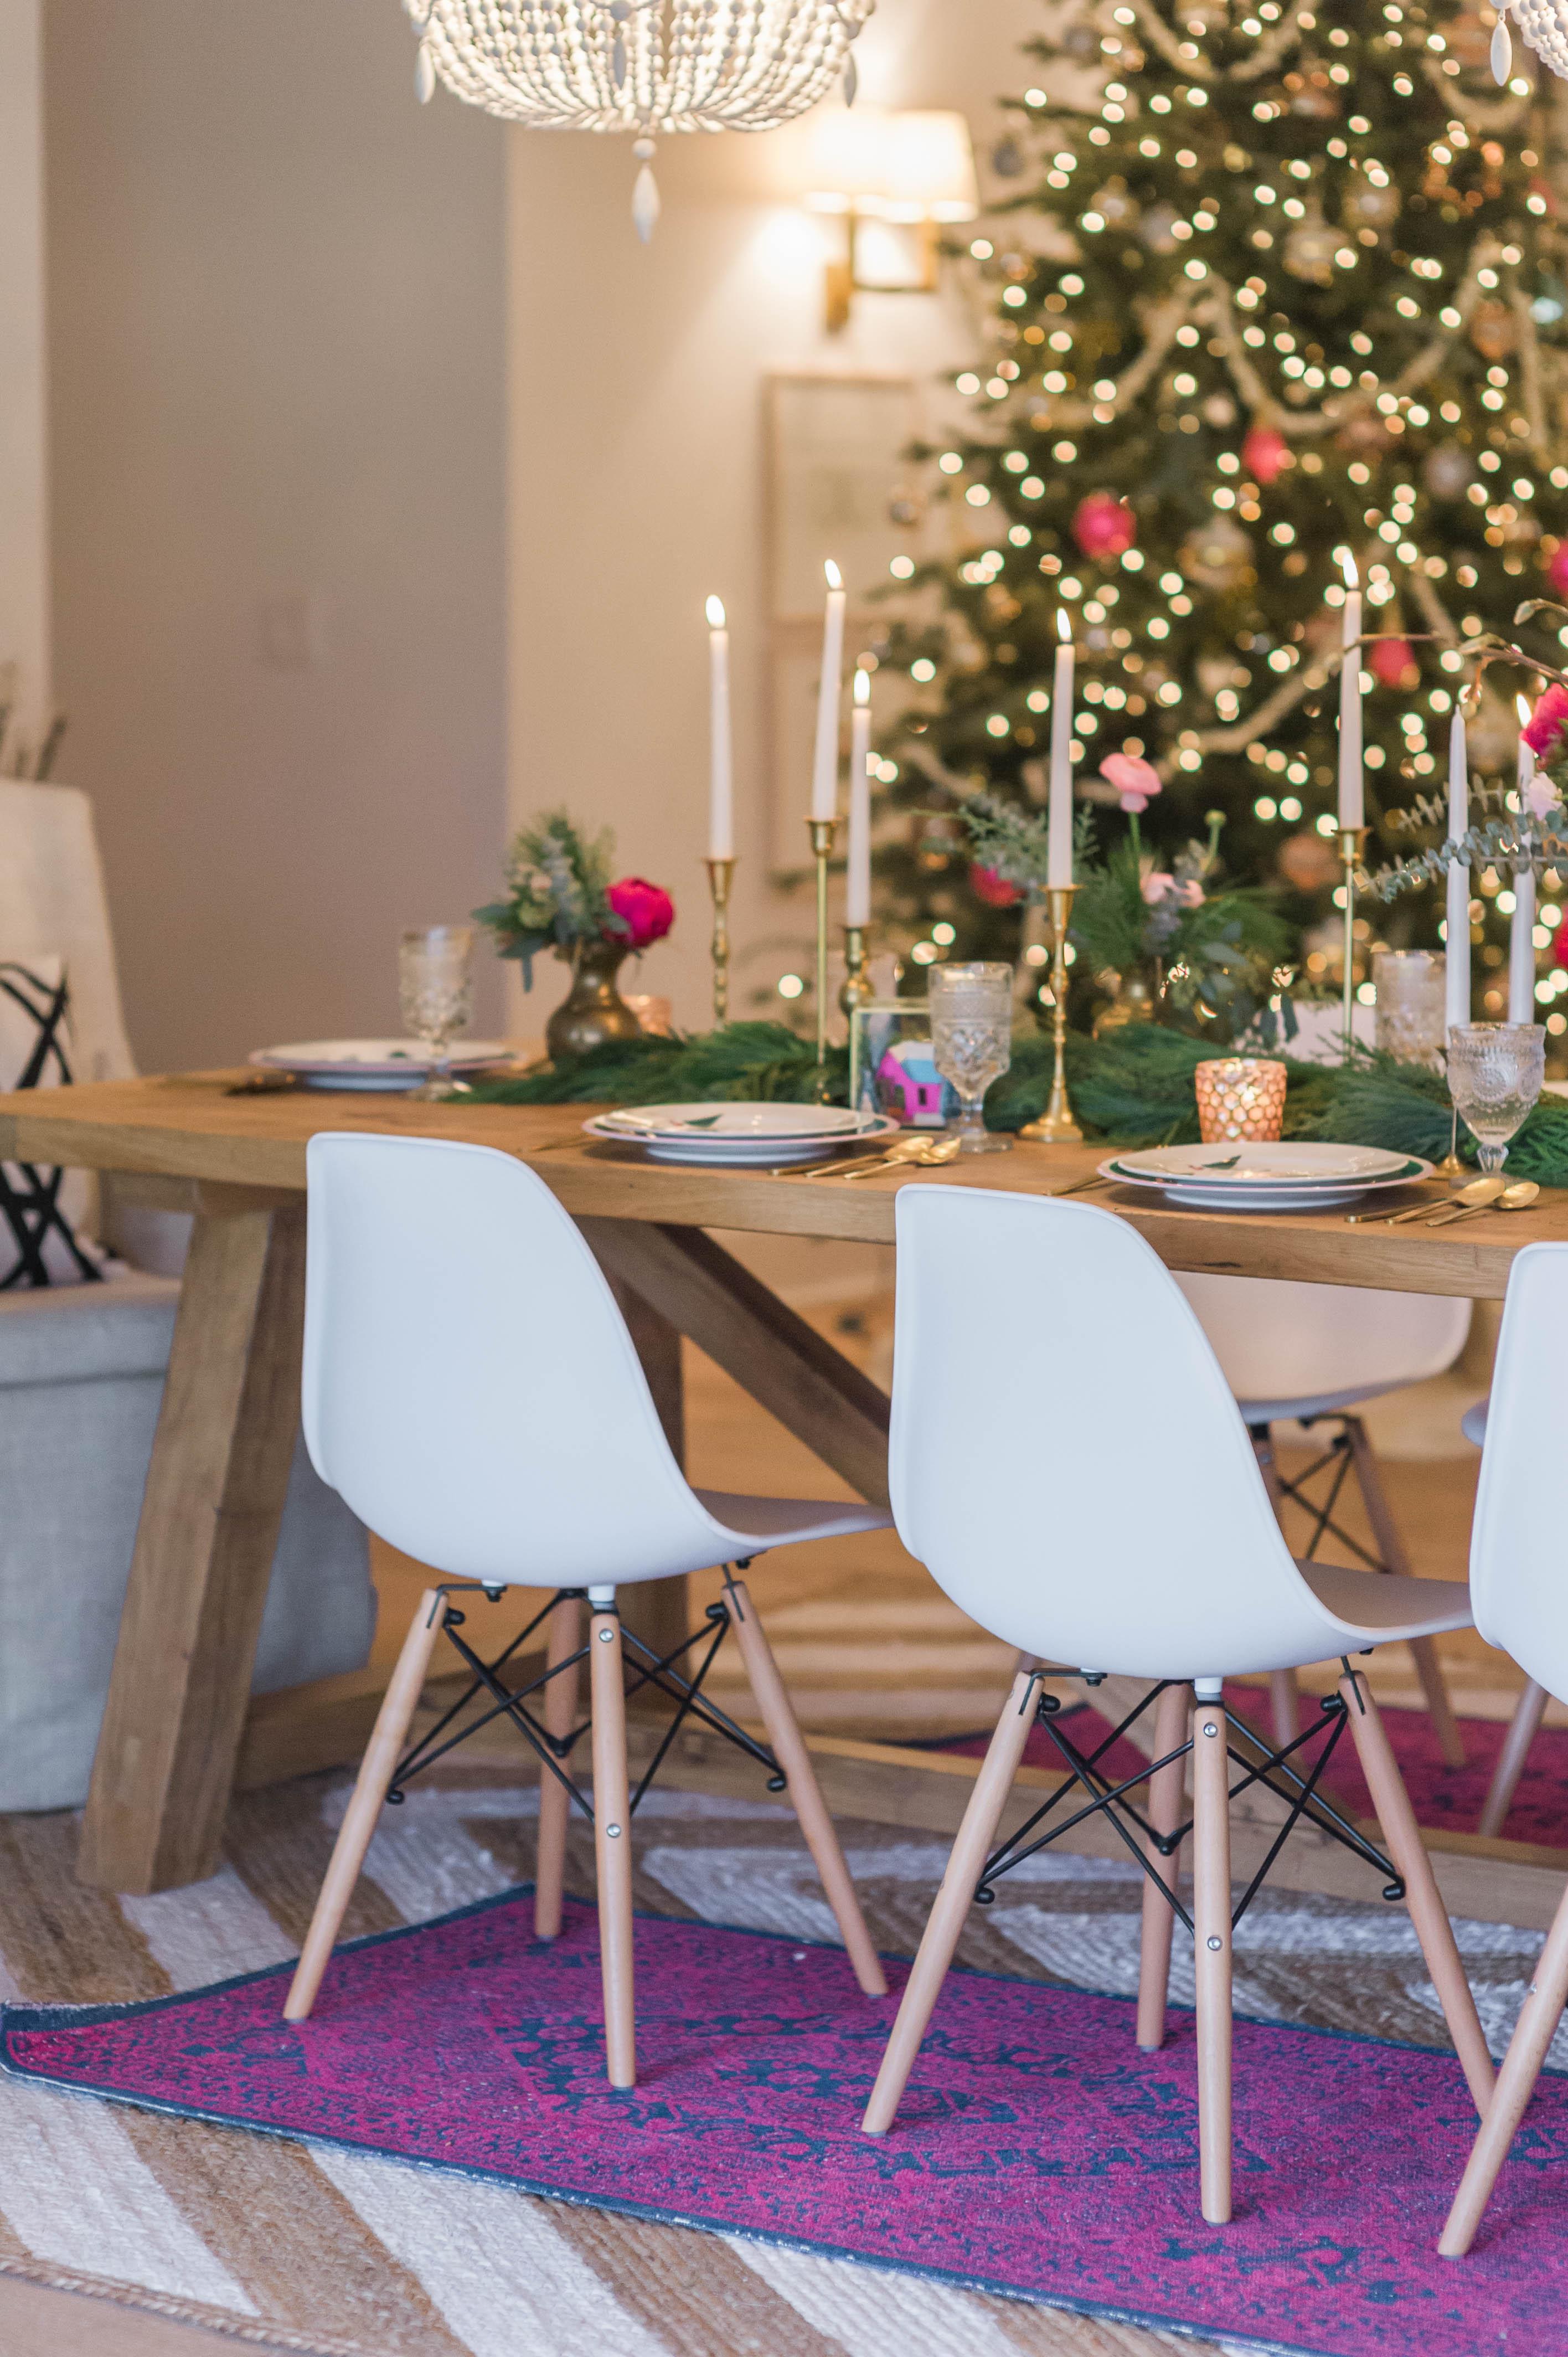 henrik_chair_canadian_tire_modern_vintage_christmas_tablescape